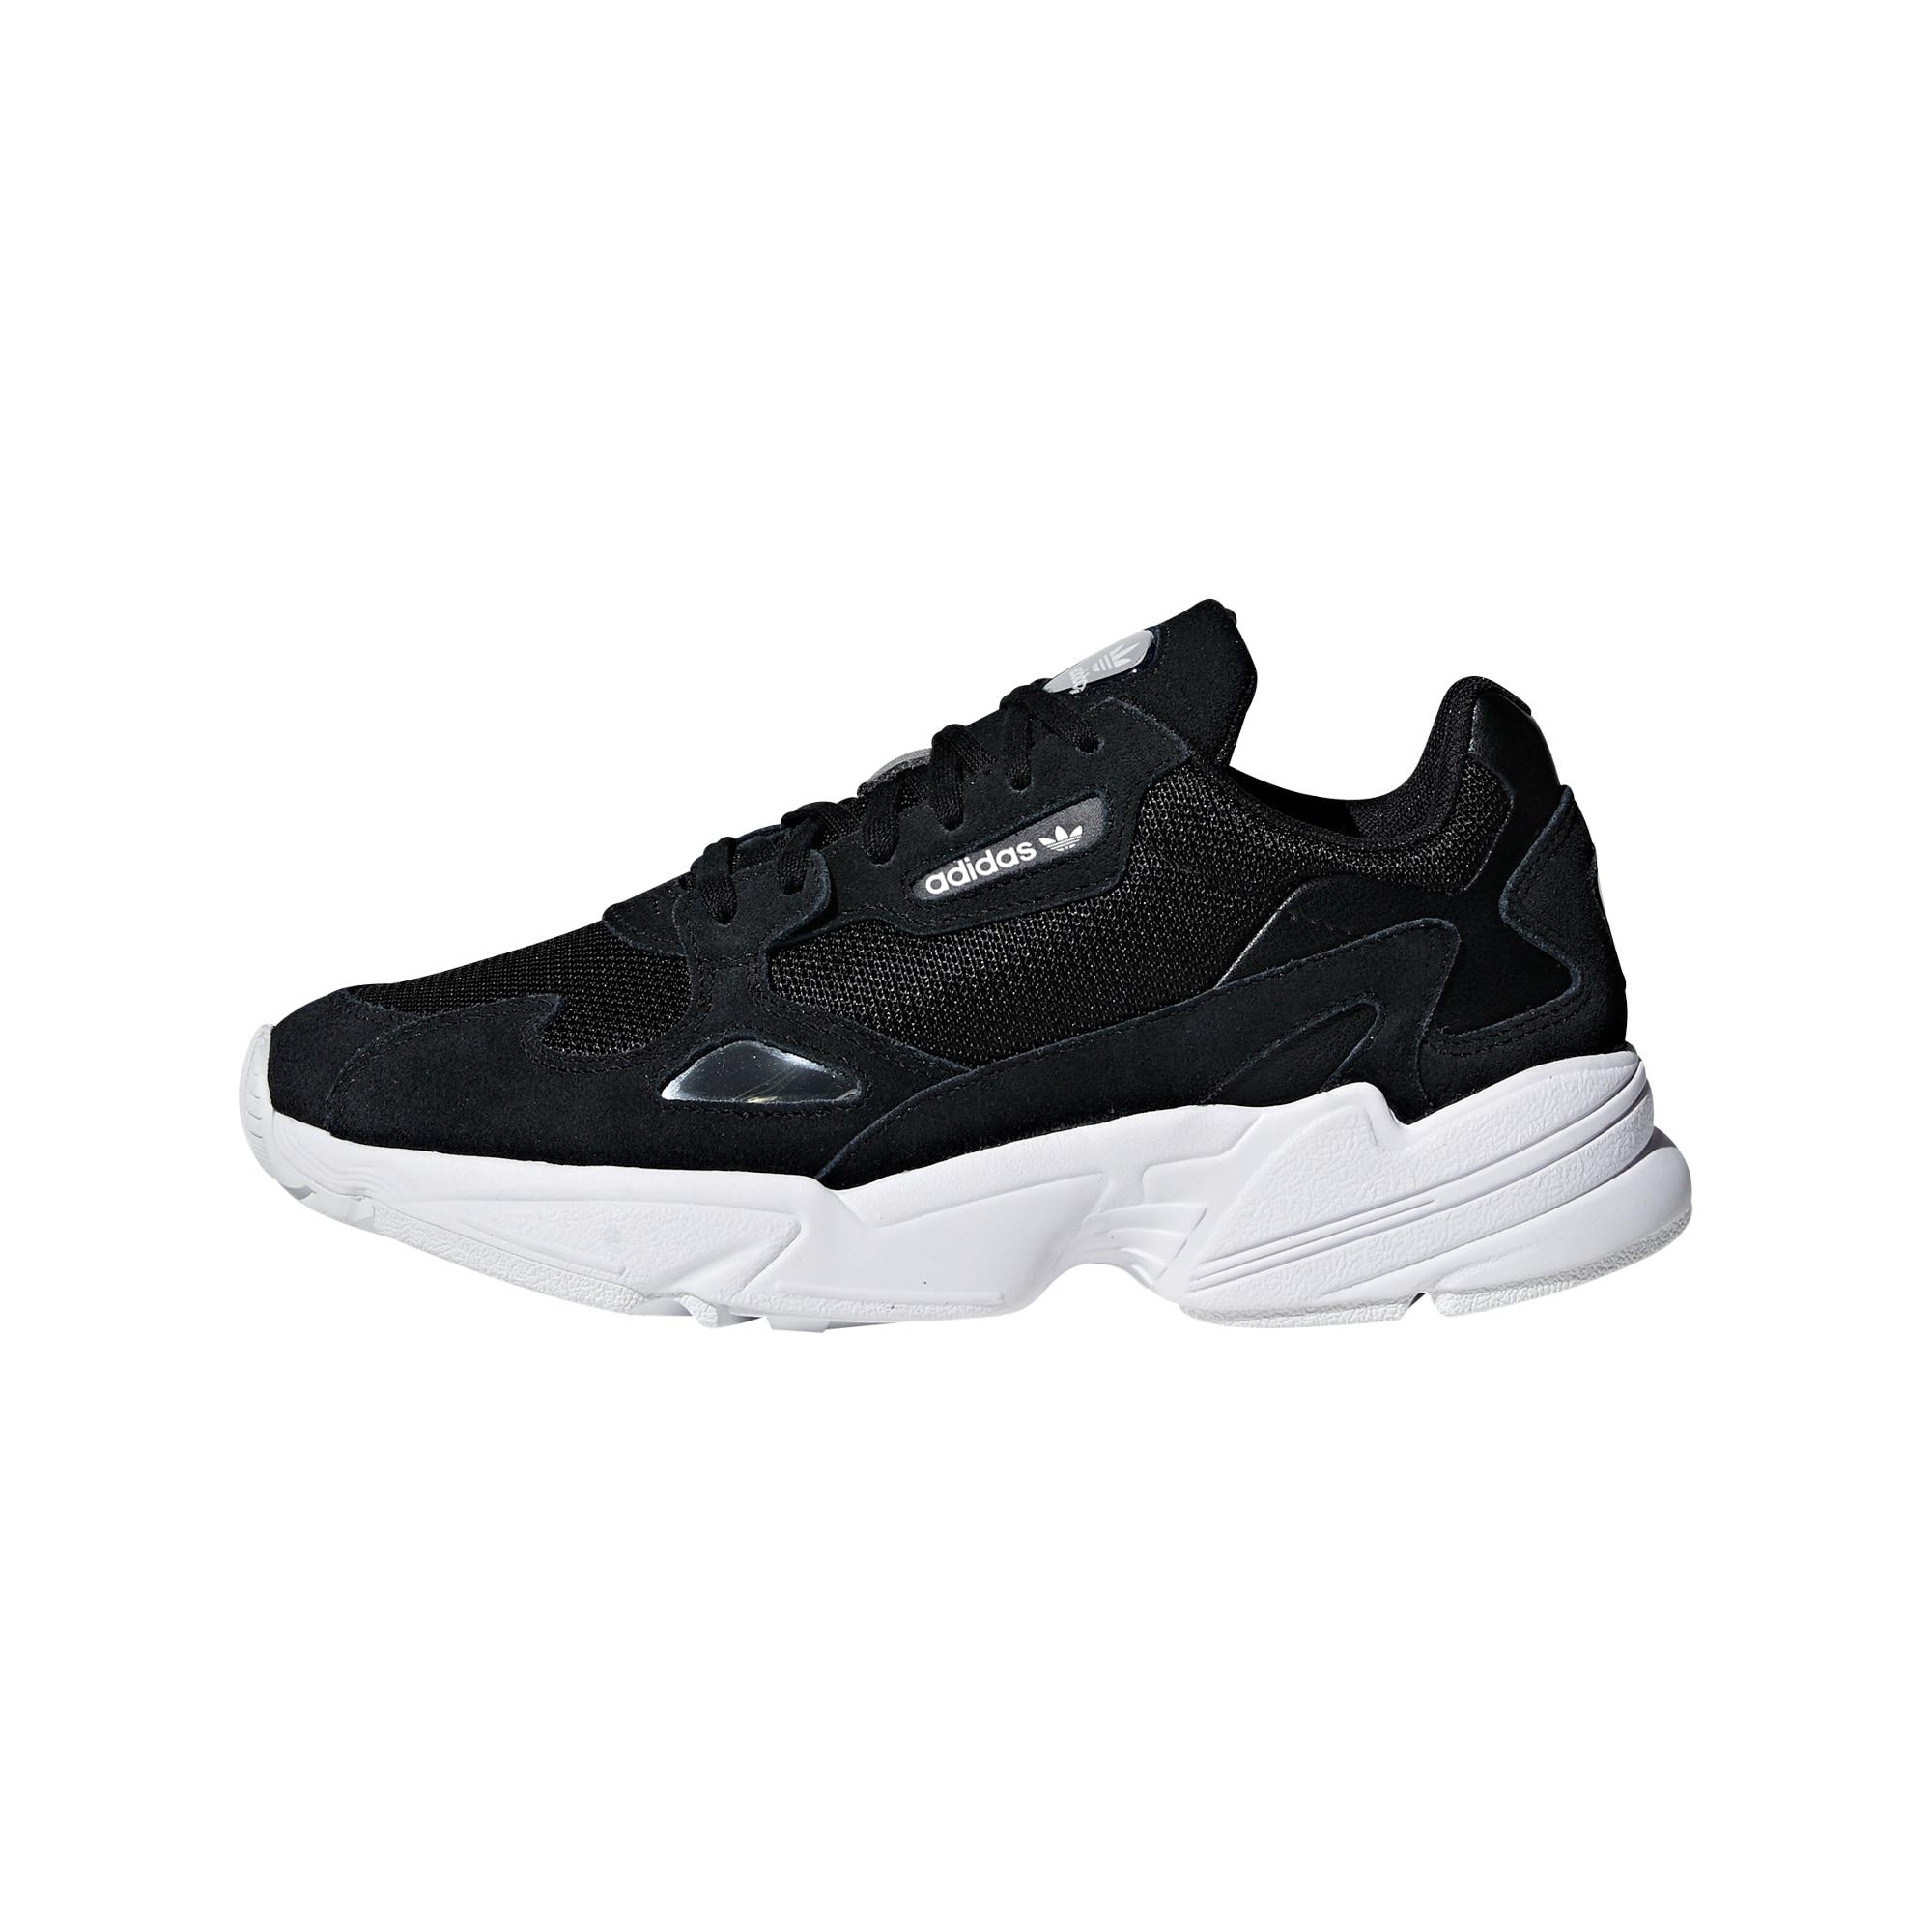 ADIDAS ORIGINALS, Dames Sneakers laag 'Falcon', zwart